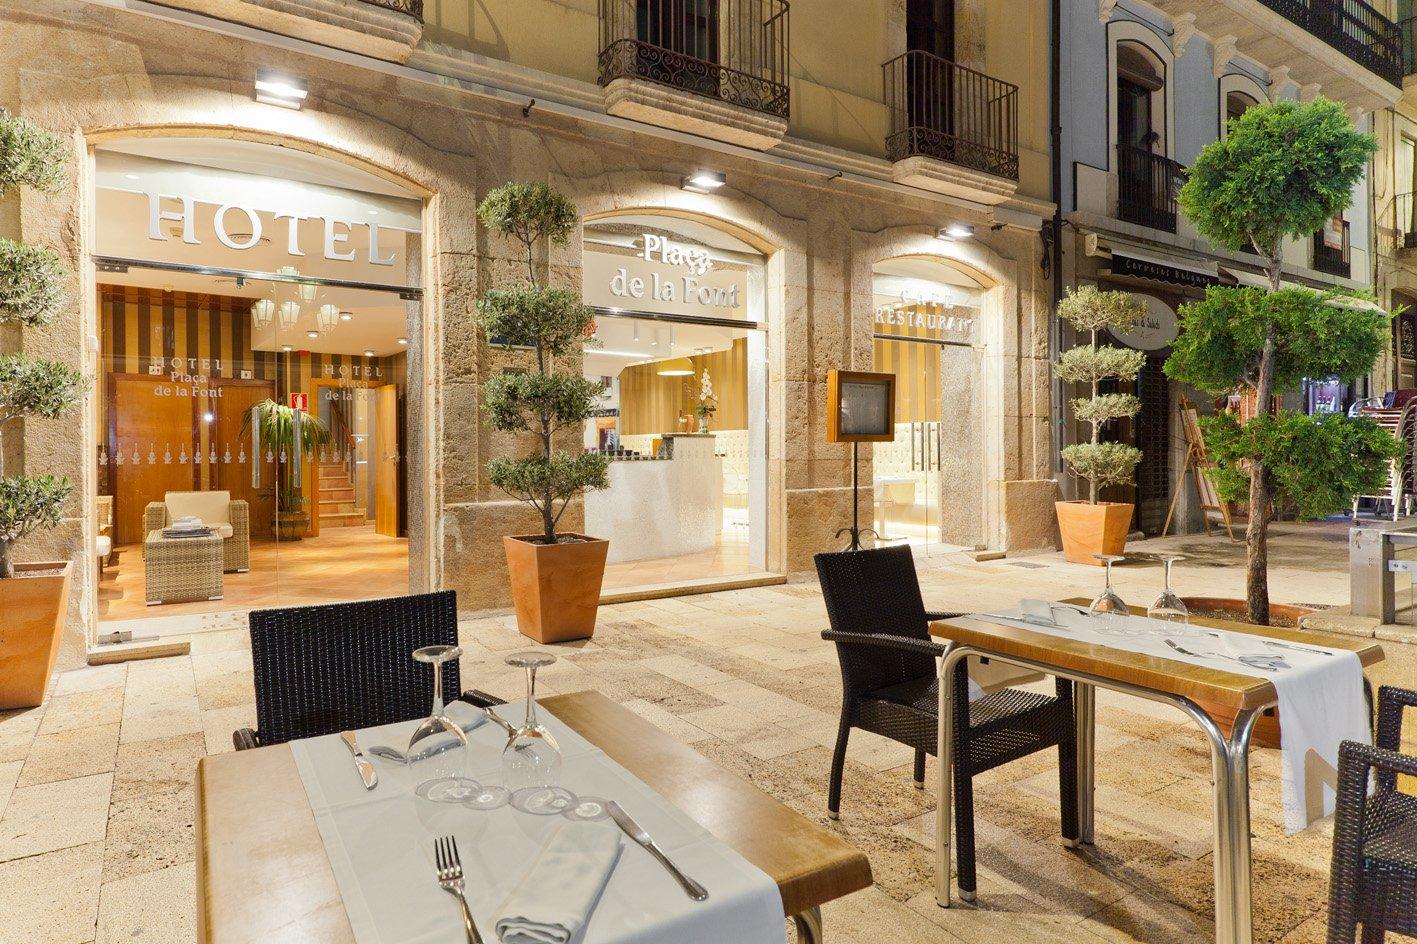 hotel_la_fontnombre_del_documento_33-849ebeea1652f31054dba23ee55f15d1